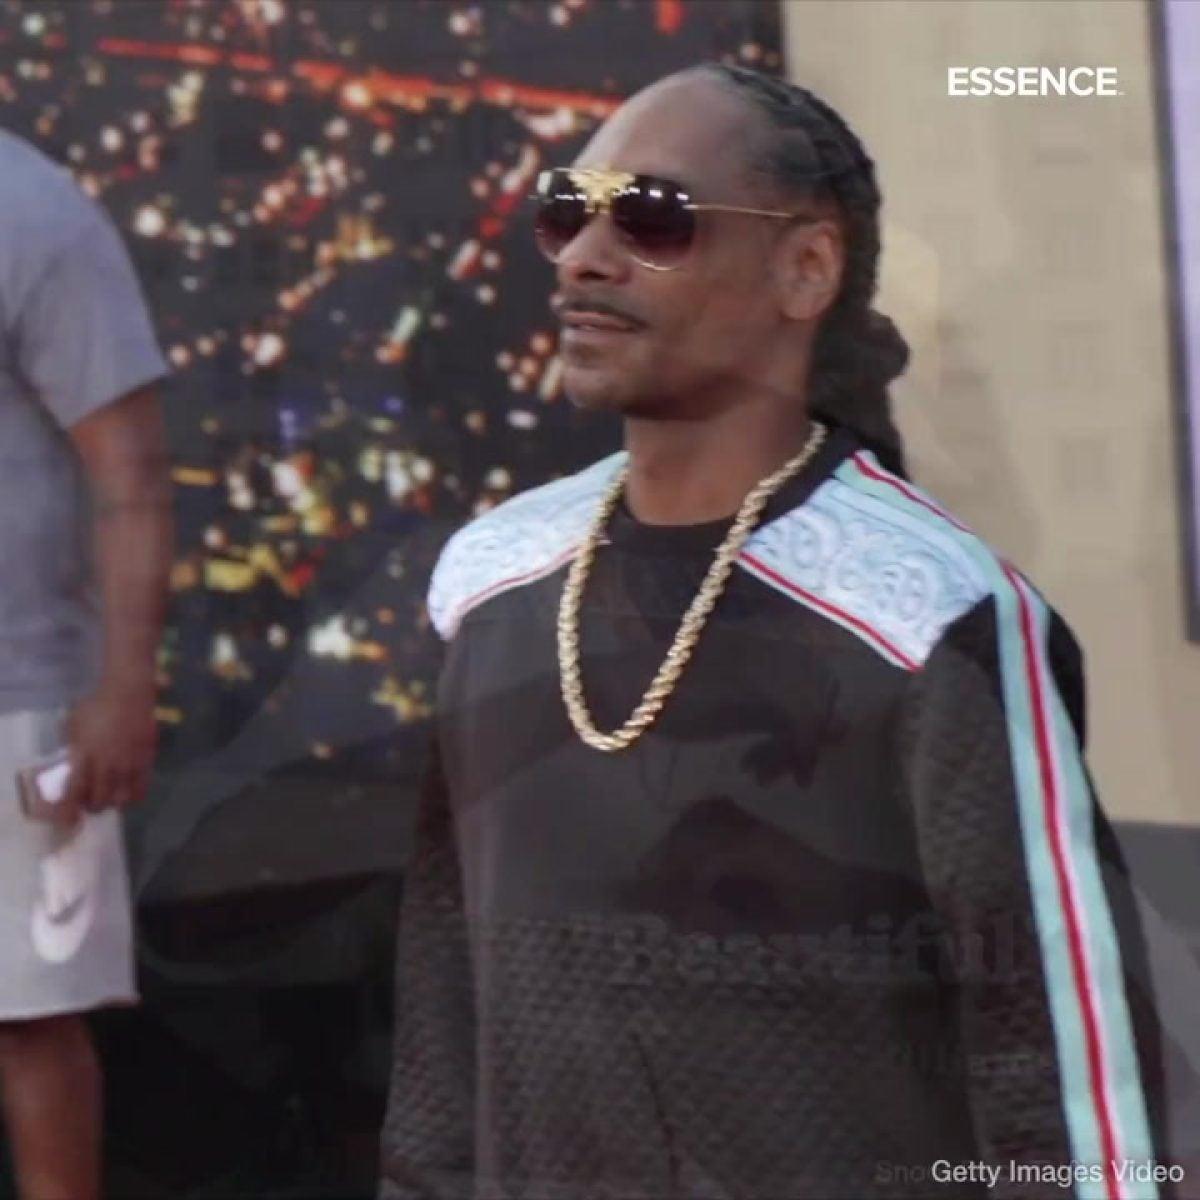 Happy Birthday, Snoop Dogg